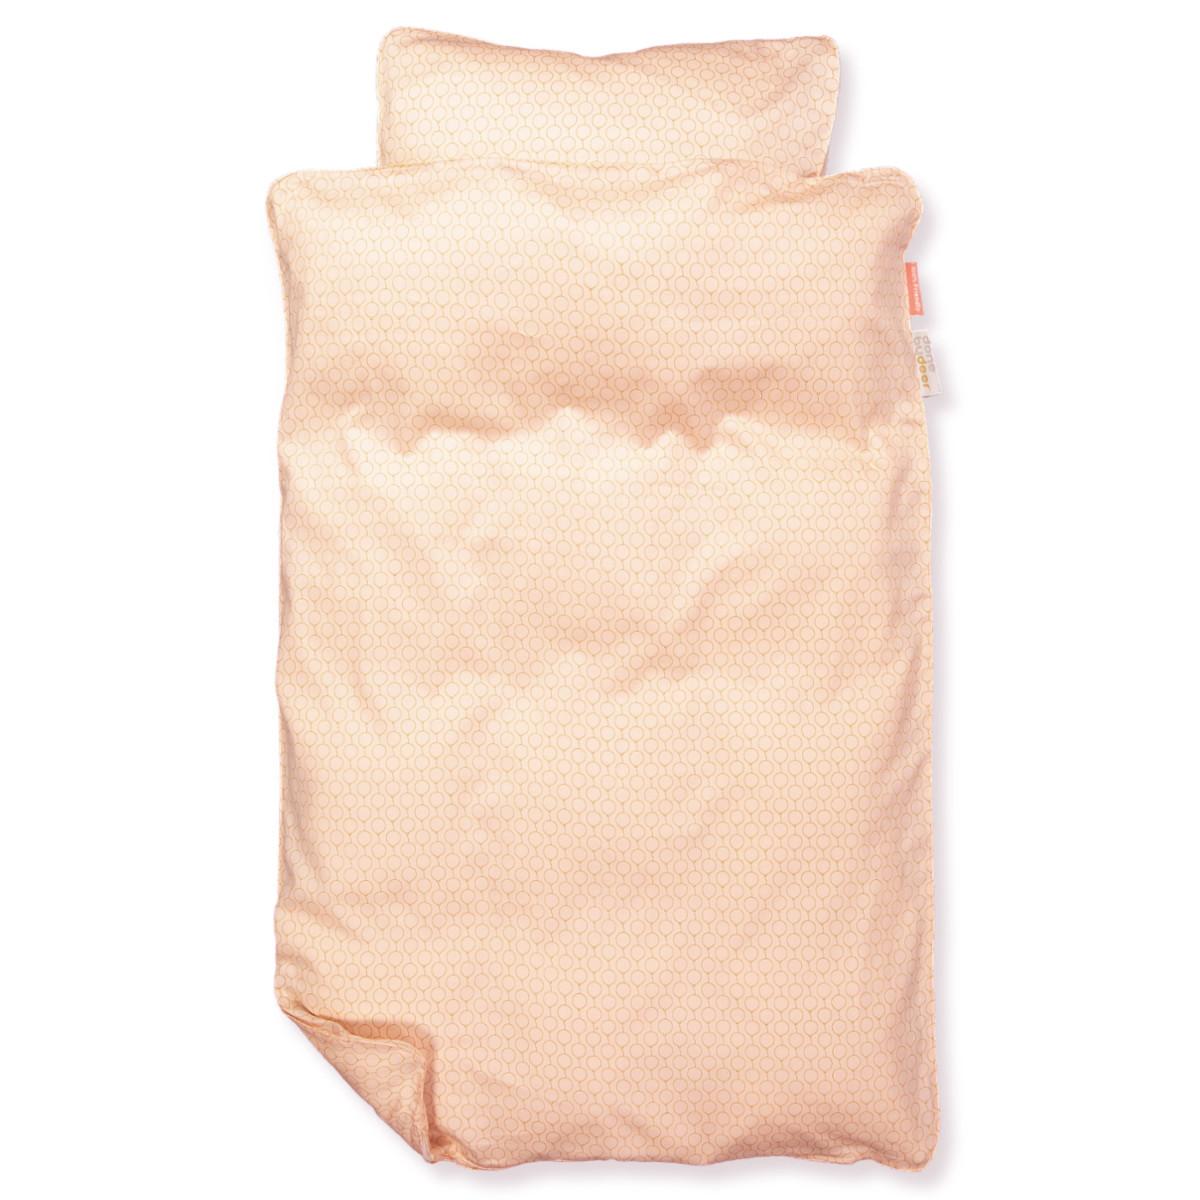 Balloon sengetøj